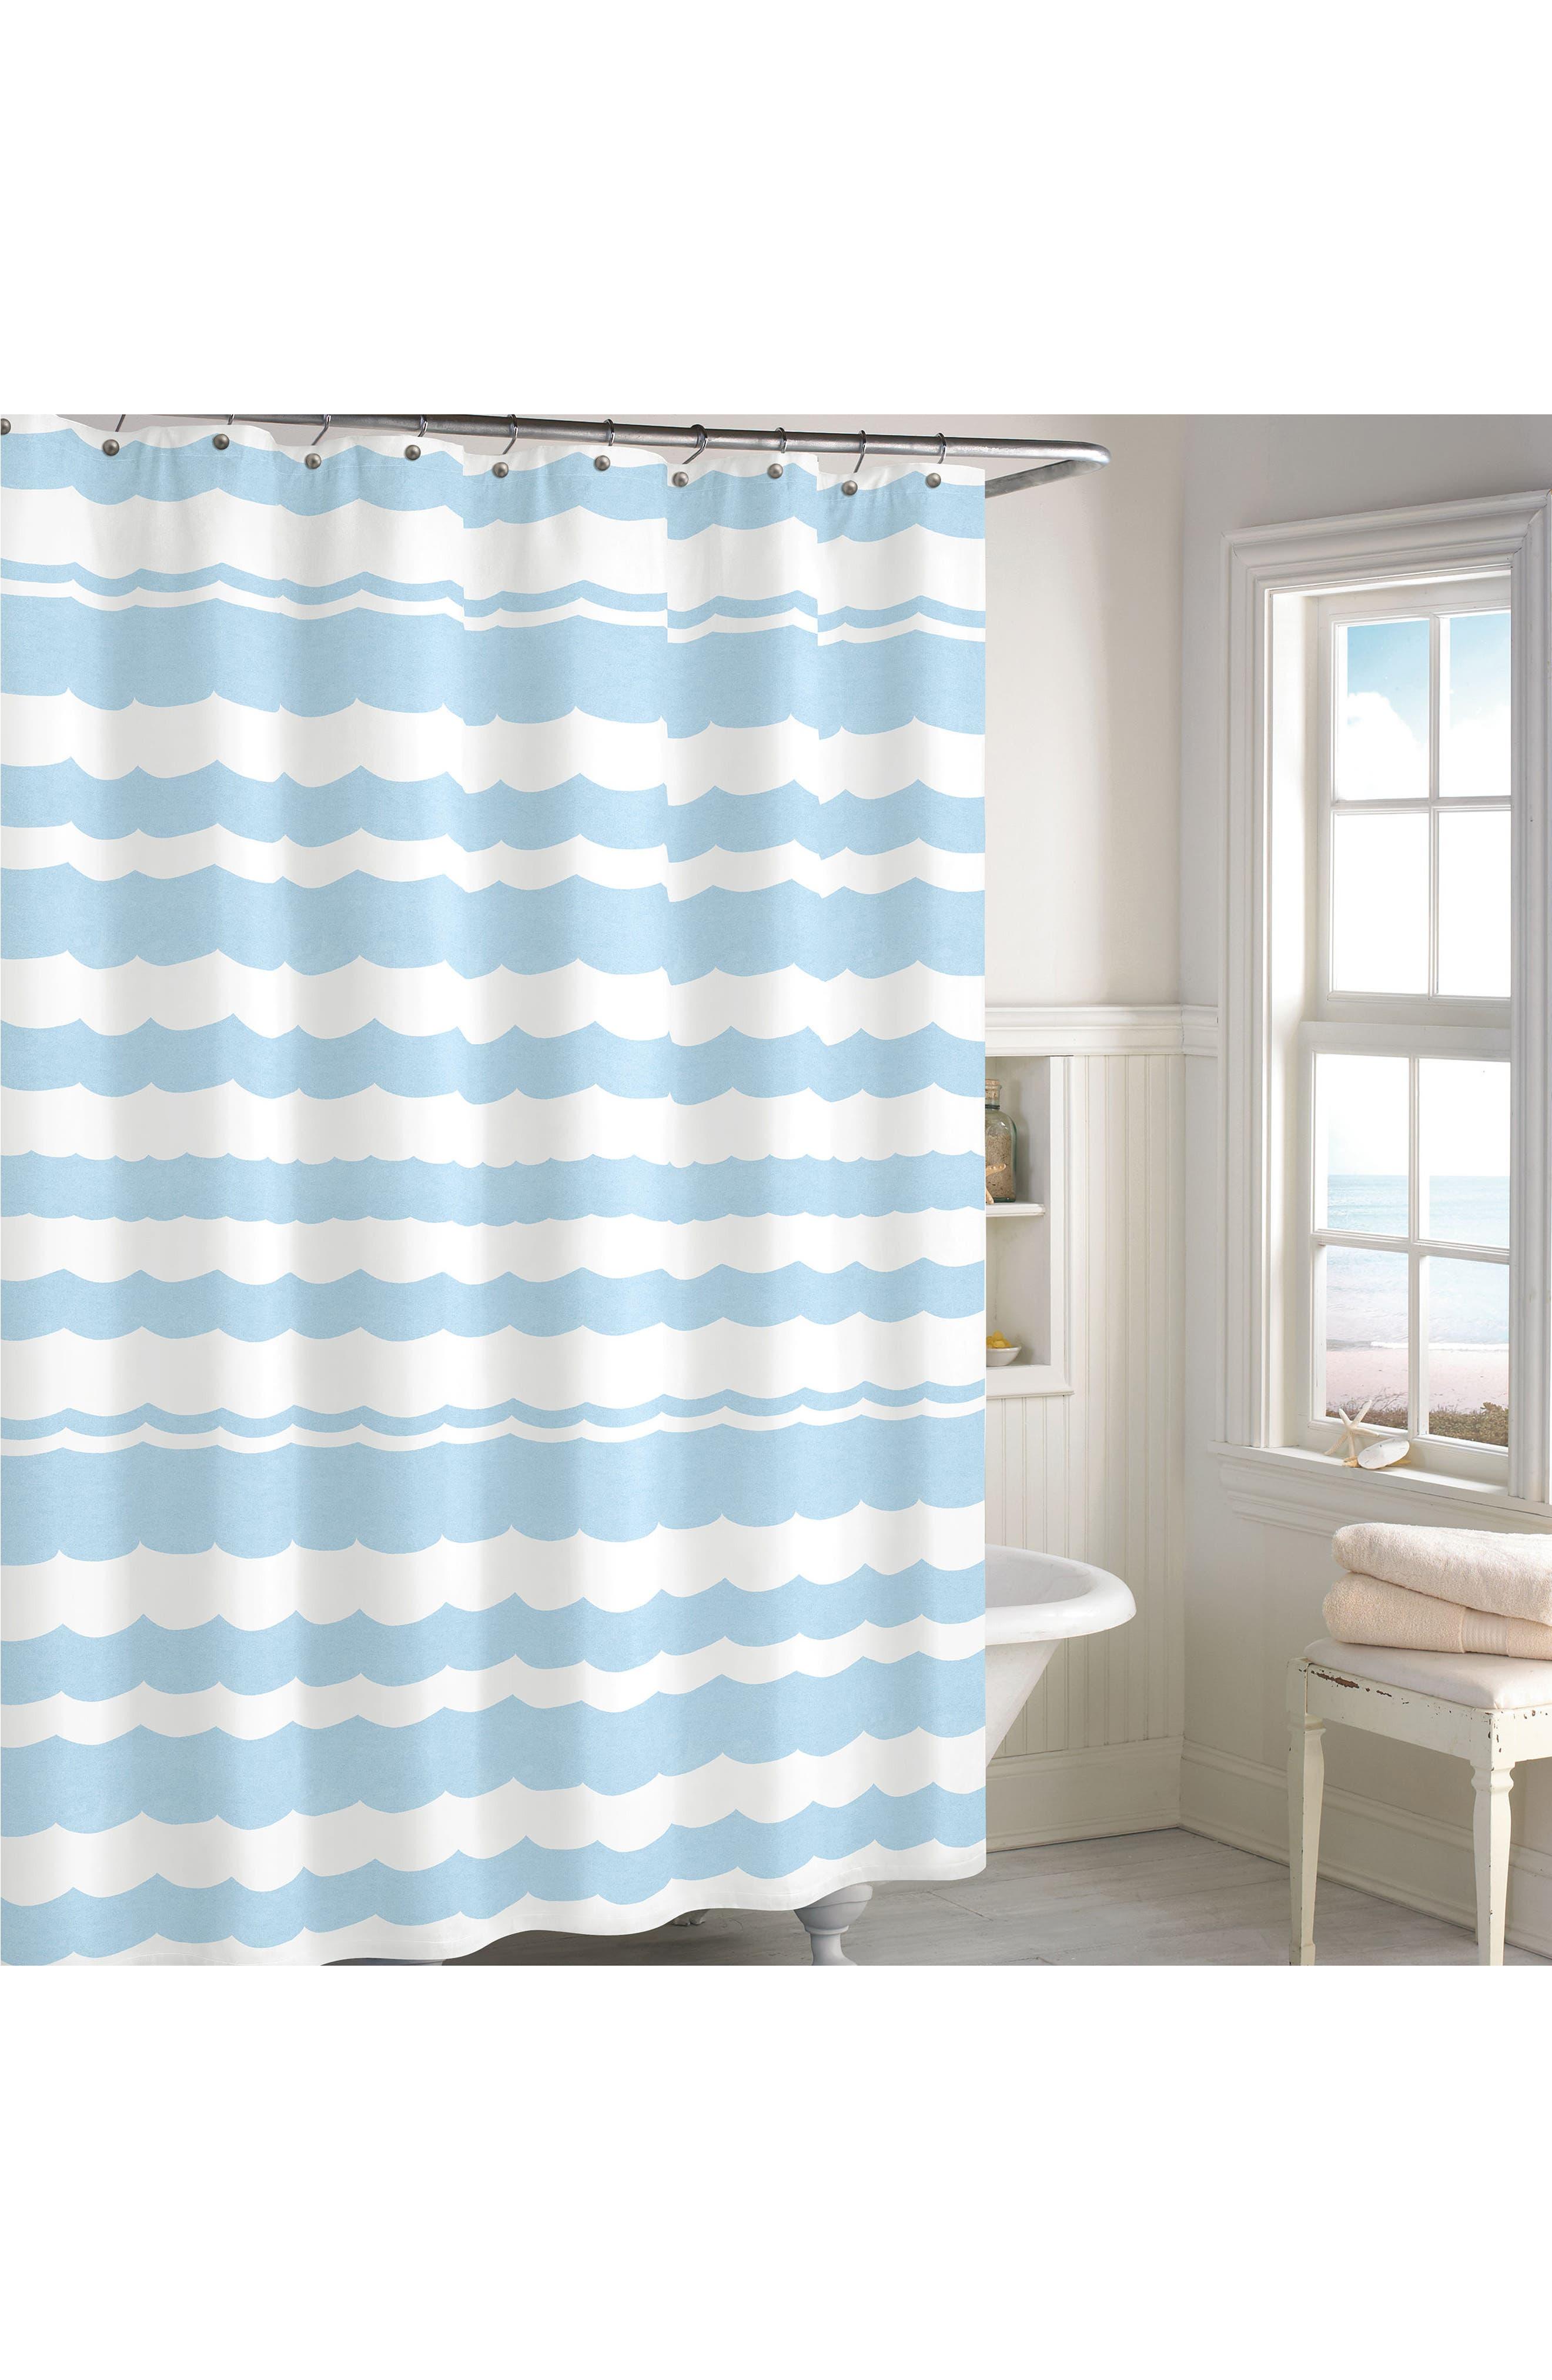 Wave Scallop Shower Curtain,                             Main thumbnail 1, color,